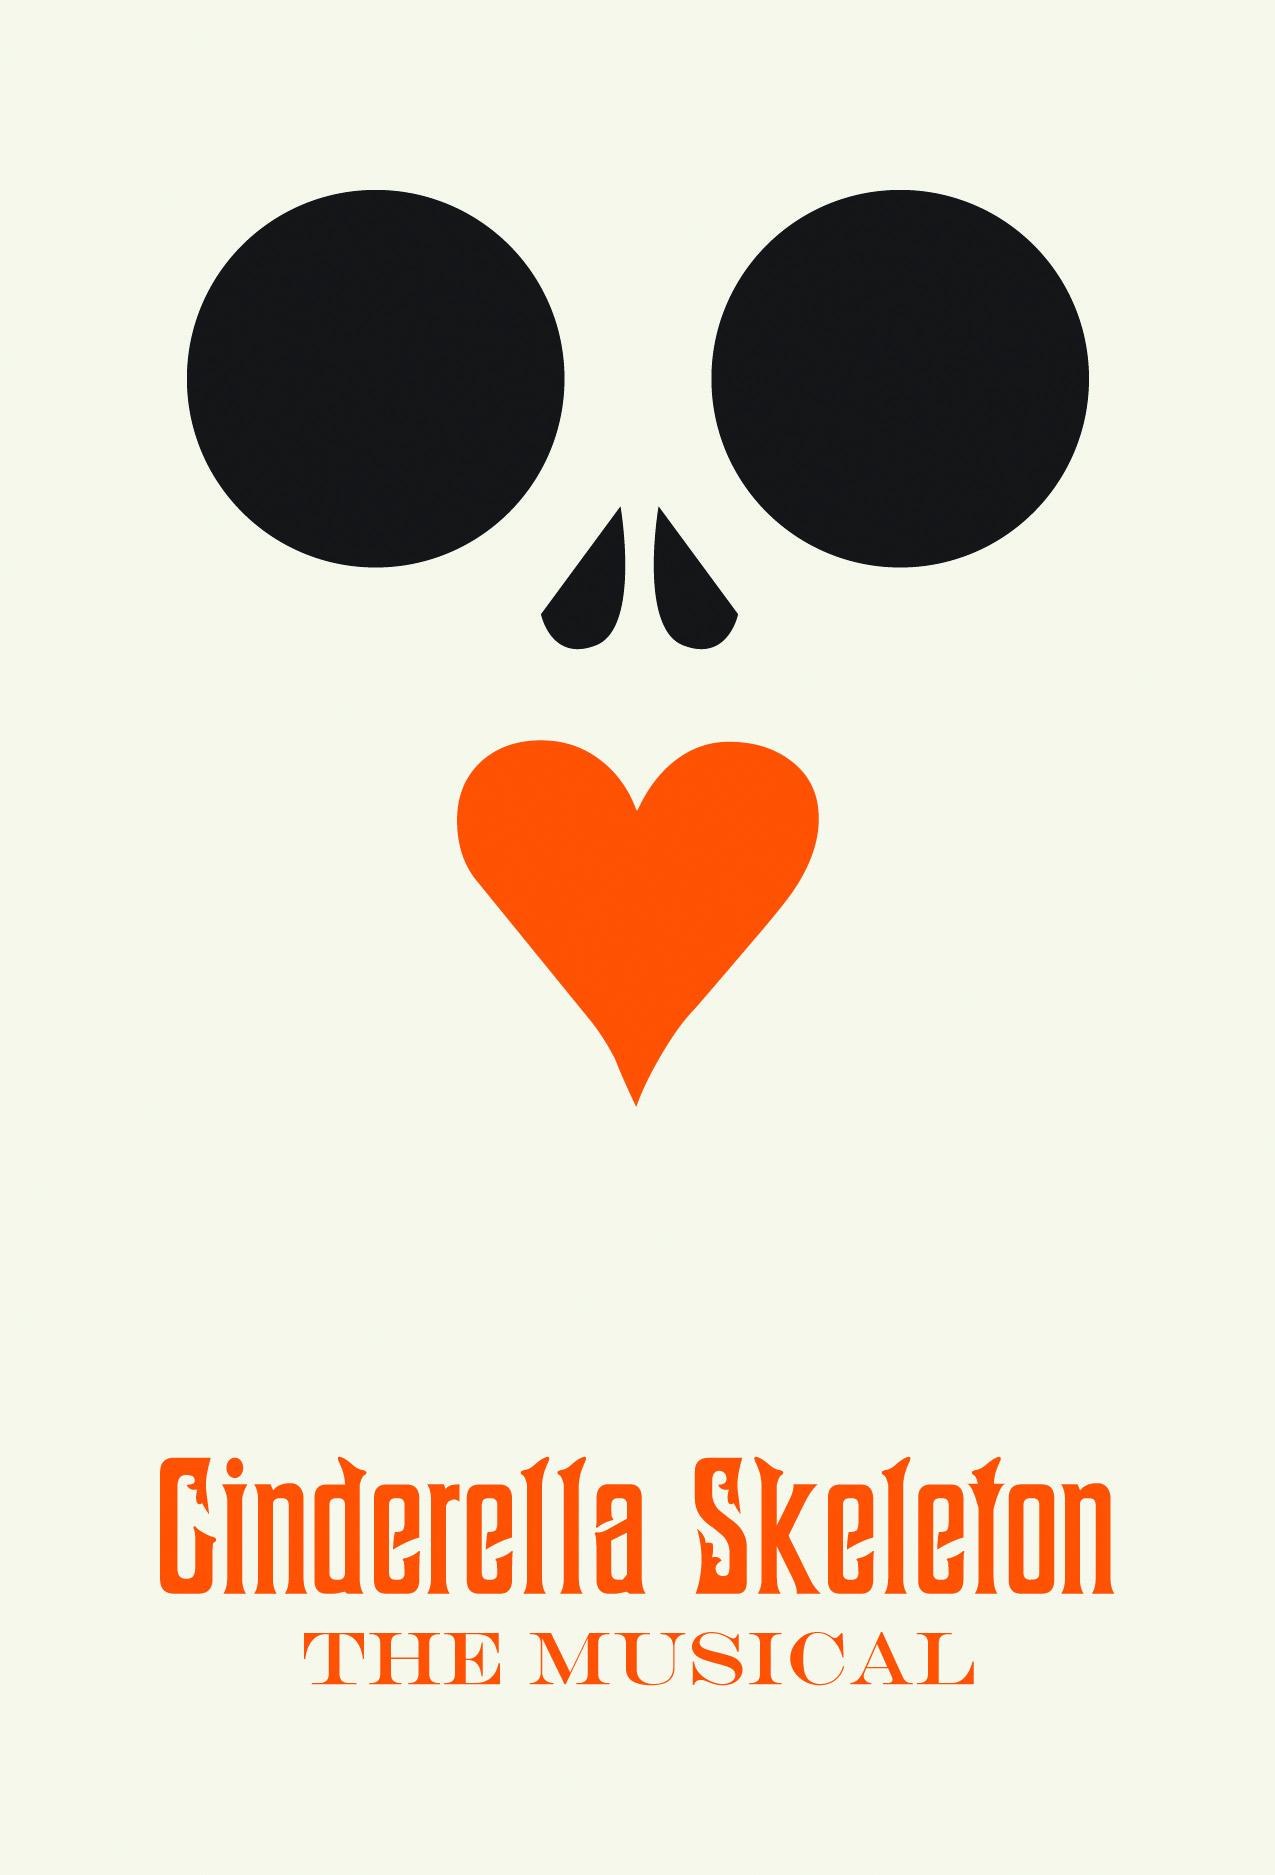 CinderellaSkeletonPostcardFront.jpg